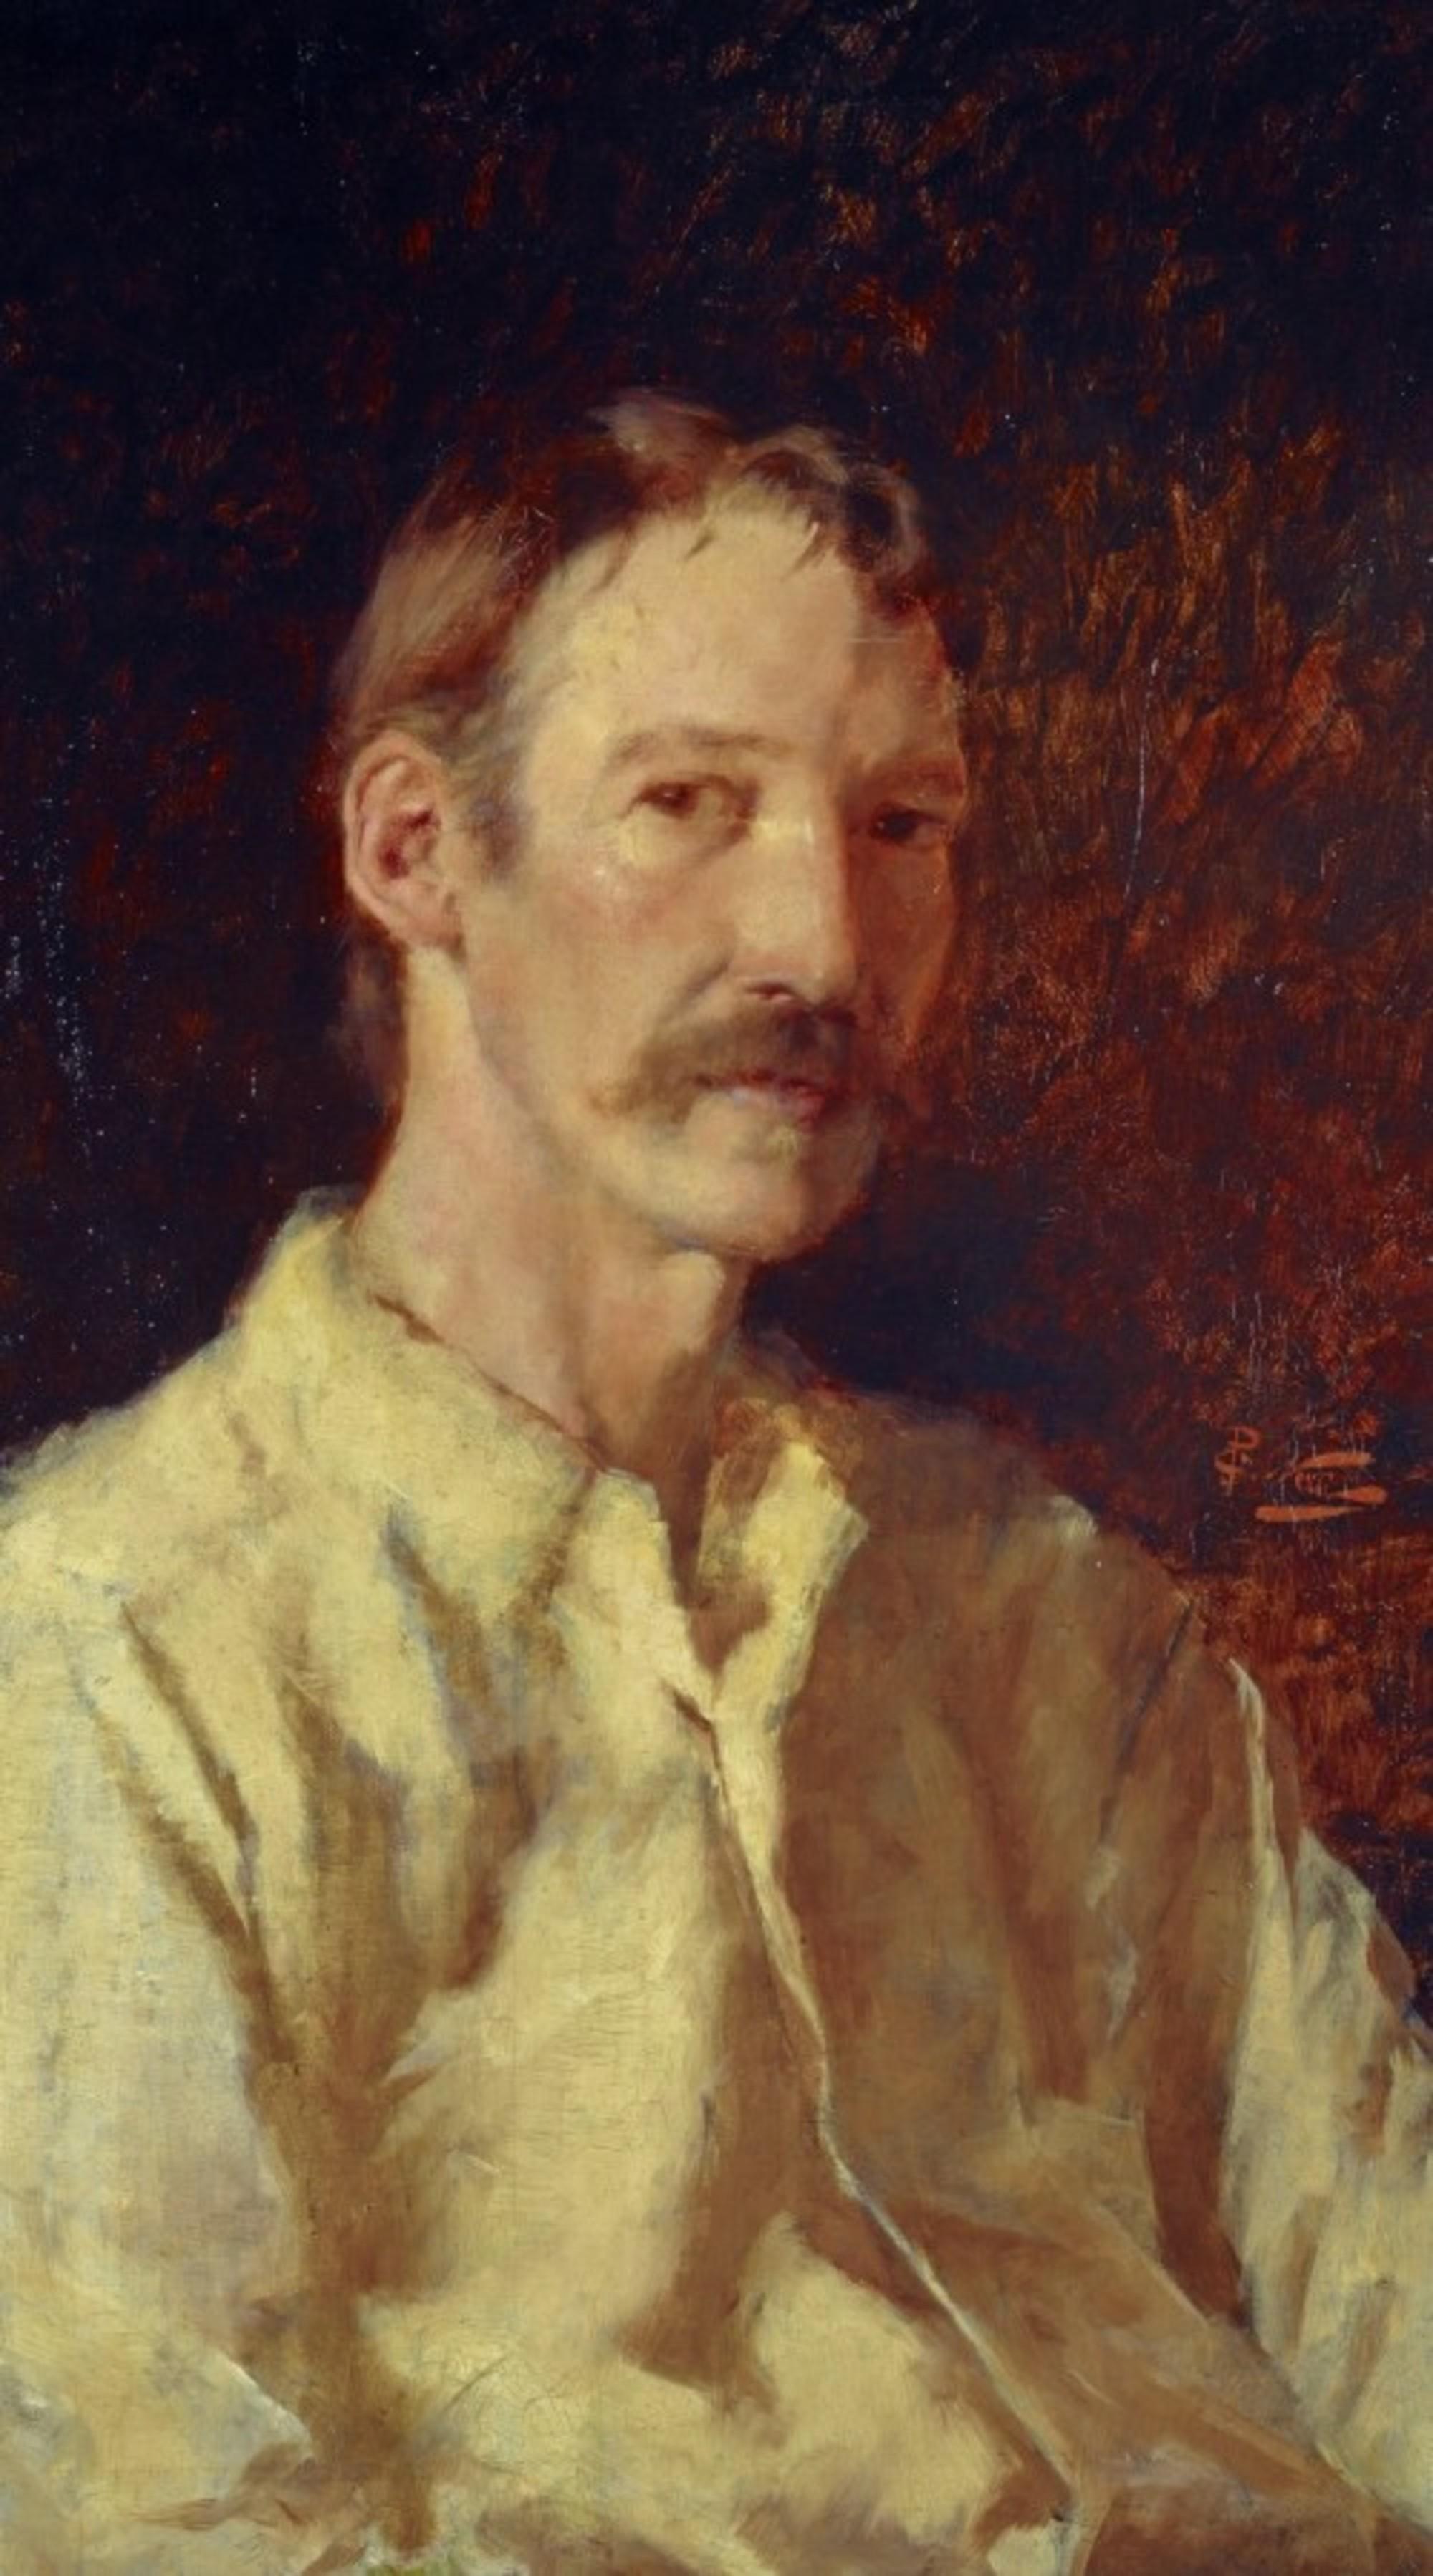 Count-Girolamo-Nerli---Robert-Louis-Stevenson-1850---1894.-Essayist-poet-and-novelist---Google-Art-Project.jpg